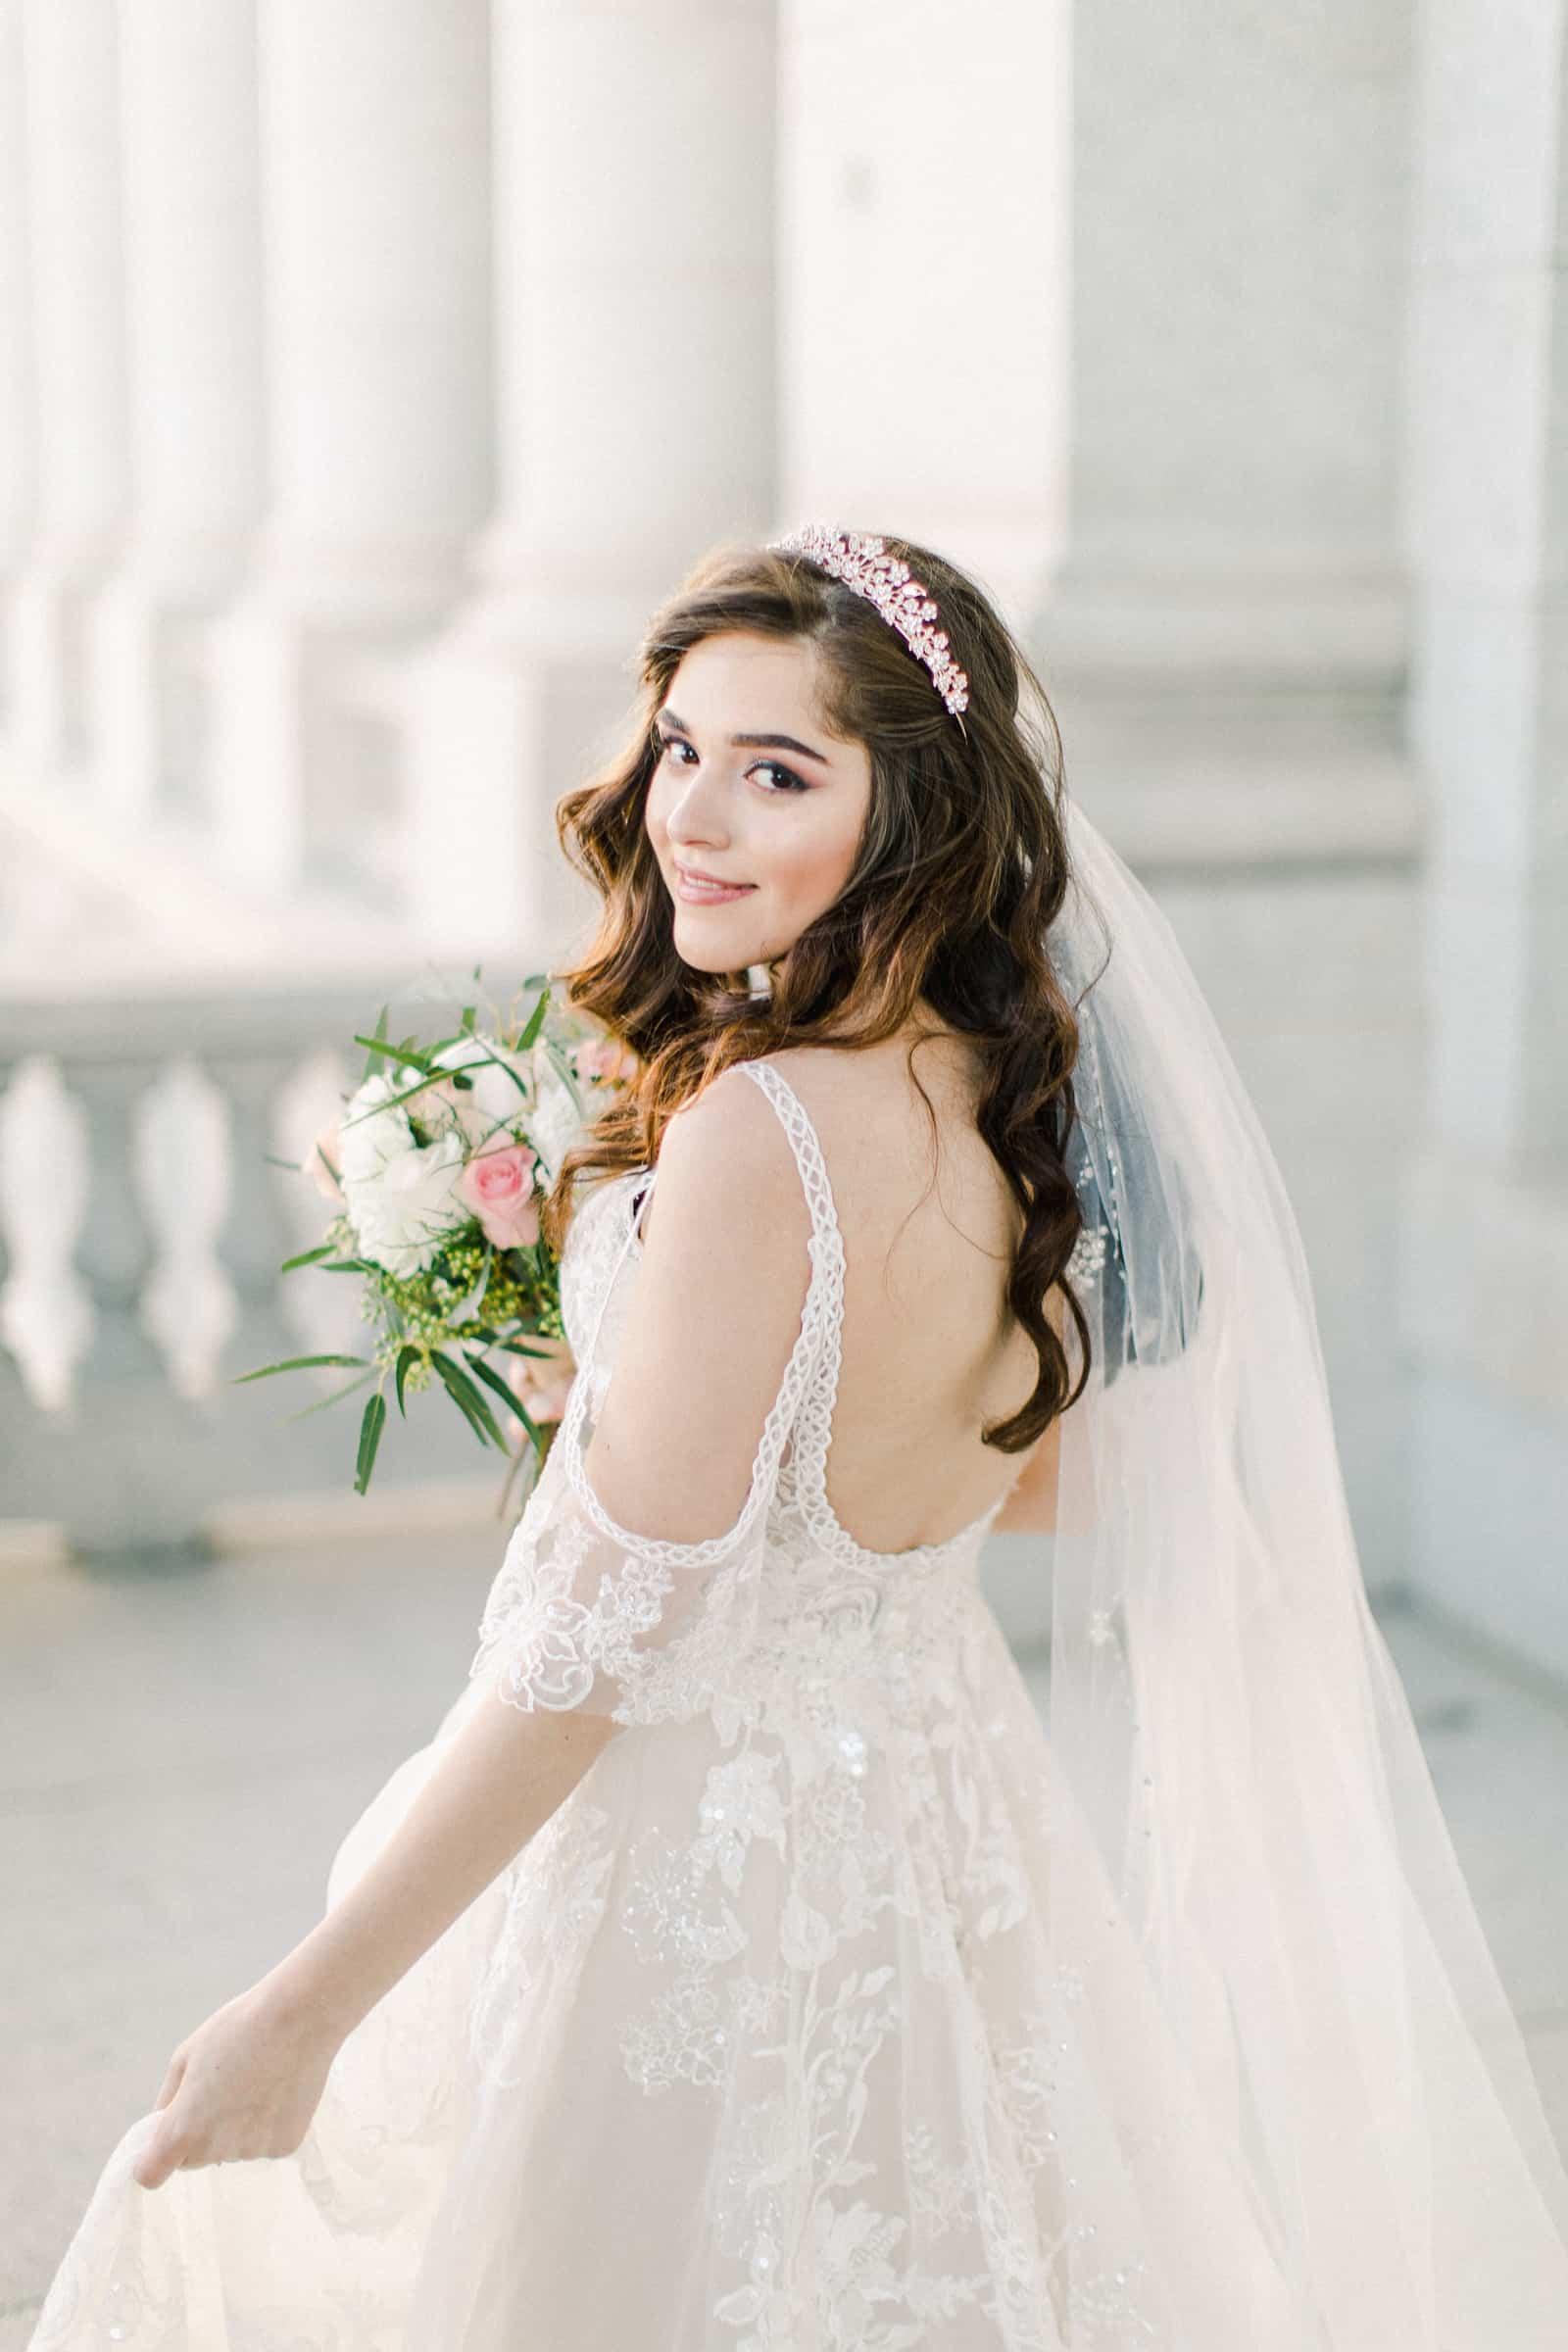 Palestinian Iranian Bride and Groom, Utah Wedding Photography at the Utah State Capitol, beautiful bride lace dress long veil jeweled headpiece